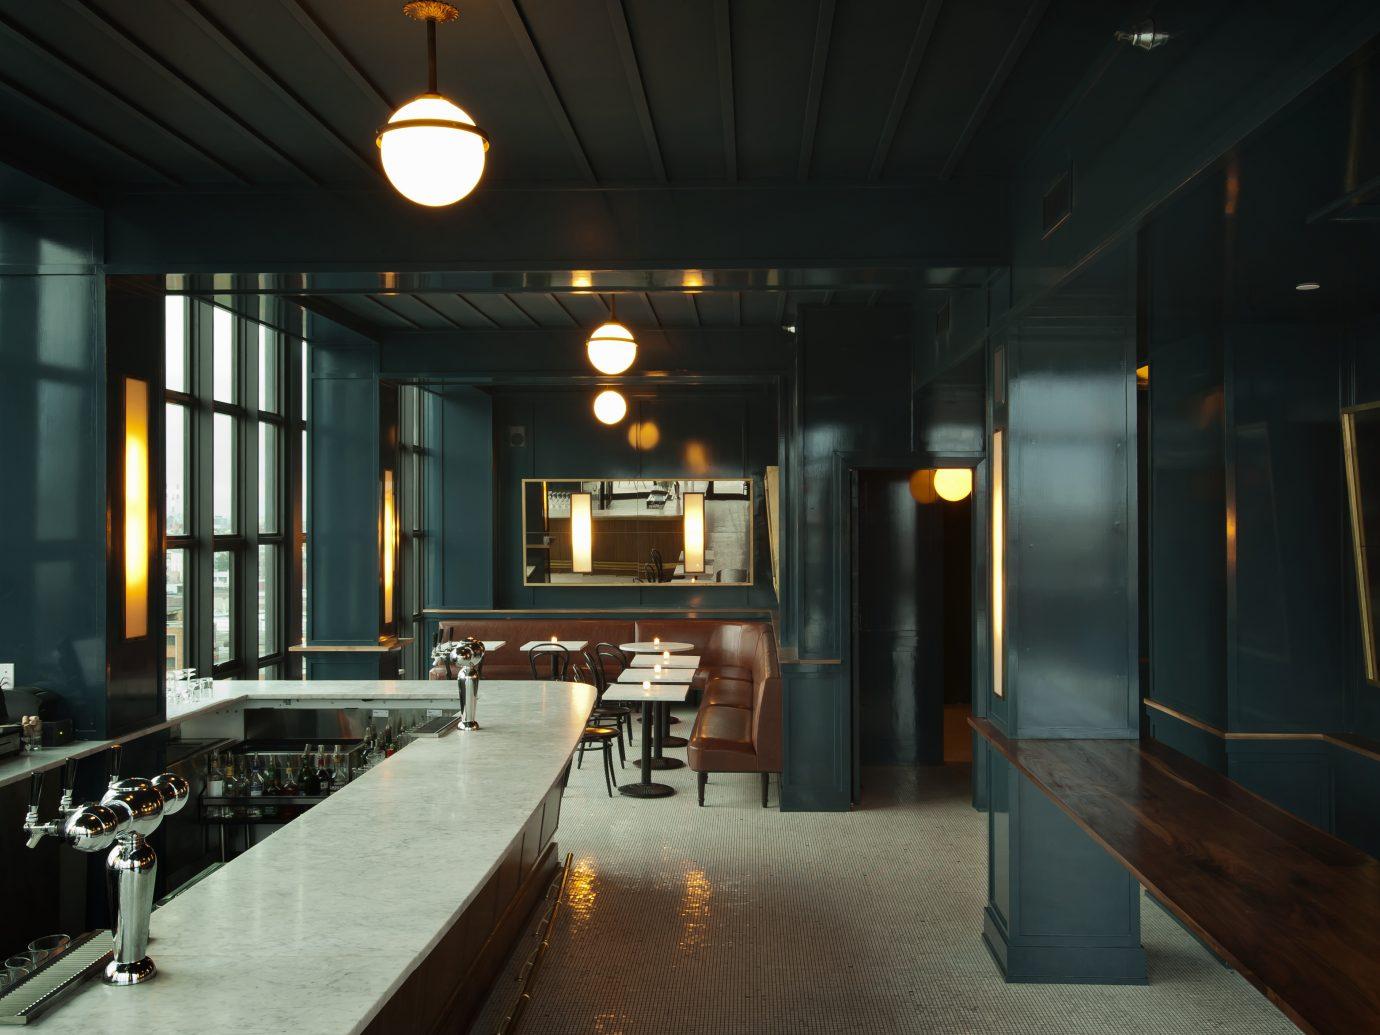 empty sleek bar interior